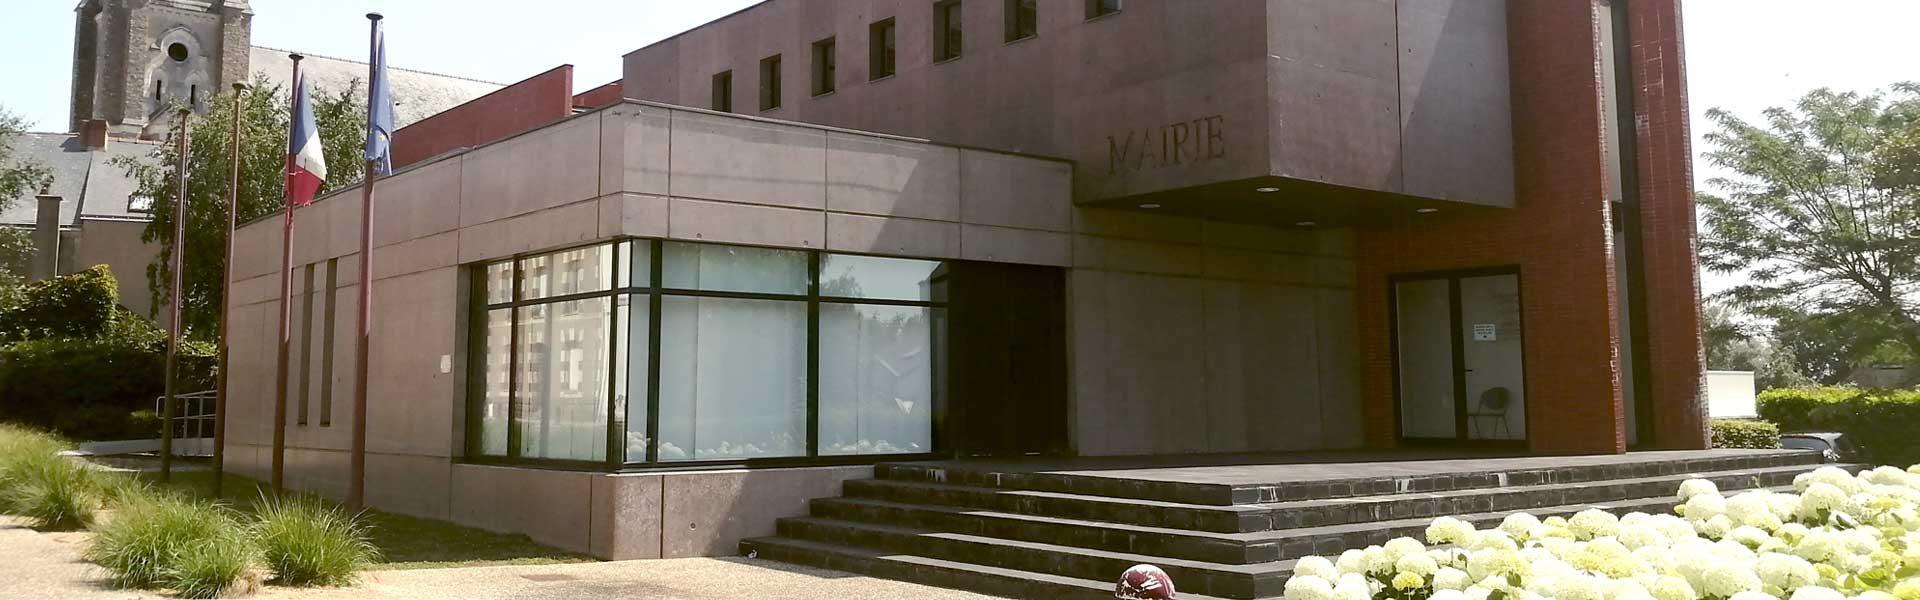 Mairie de Besné 44